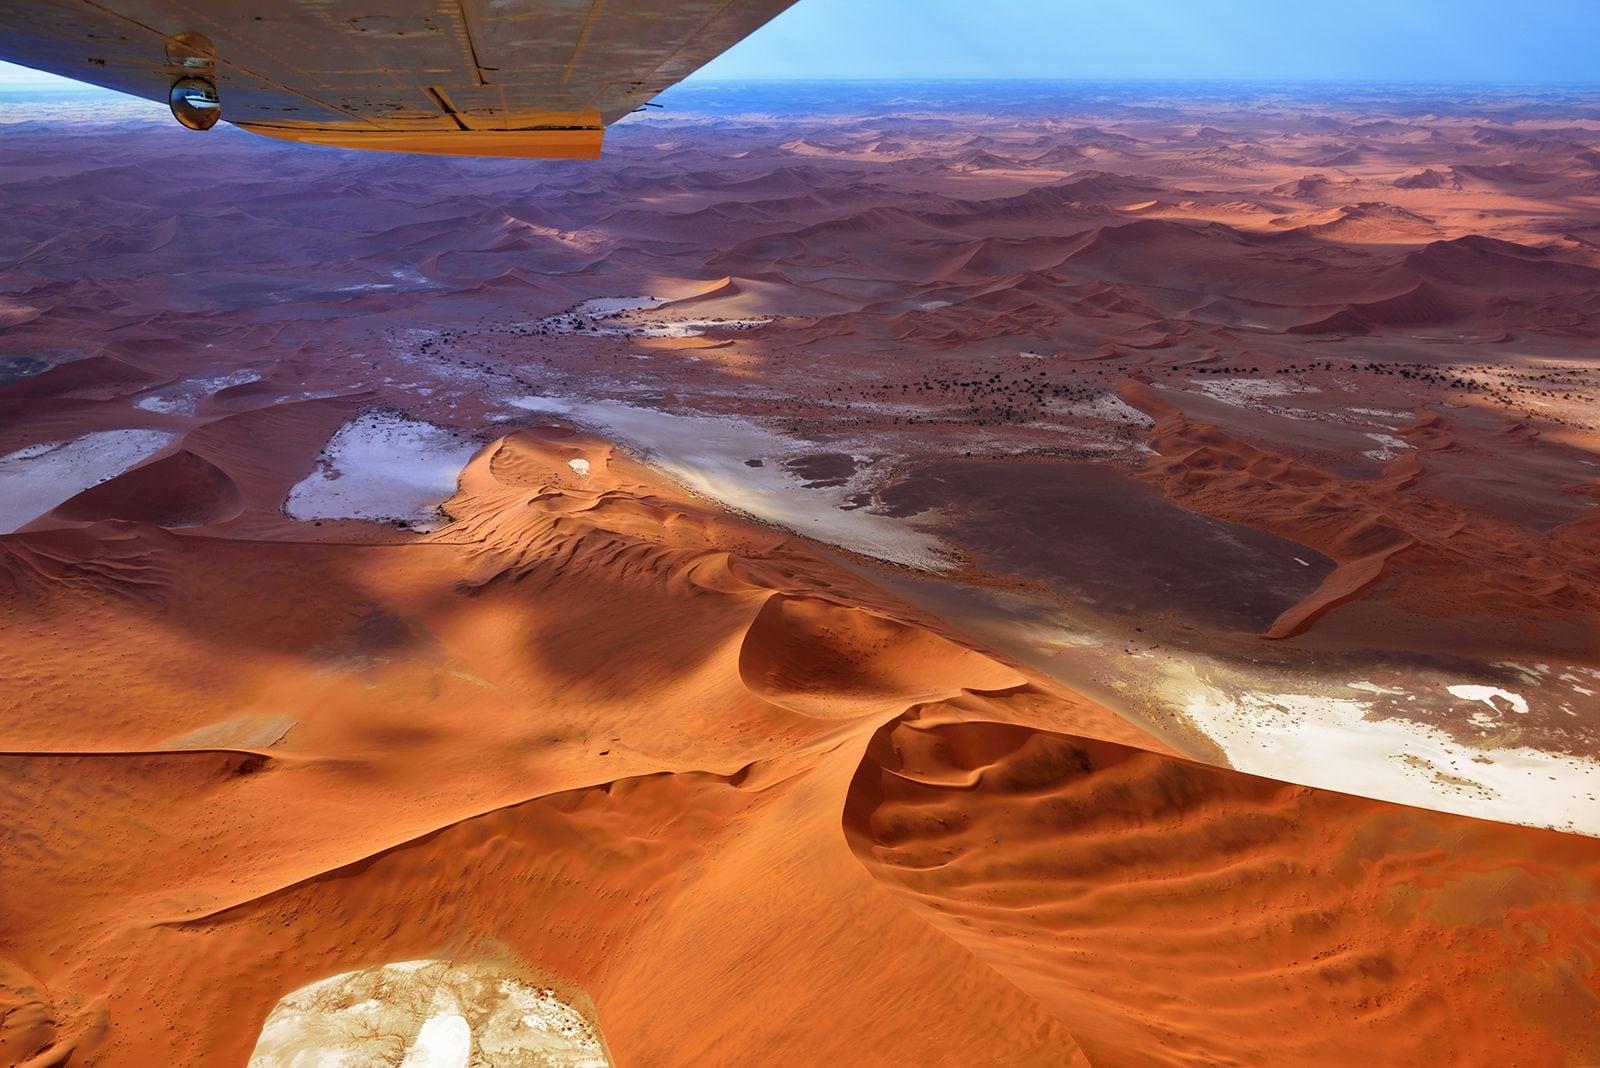 No riding. Dune Tour. Accommodation near Sesriem